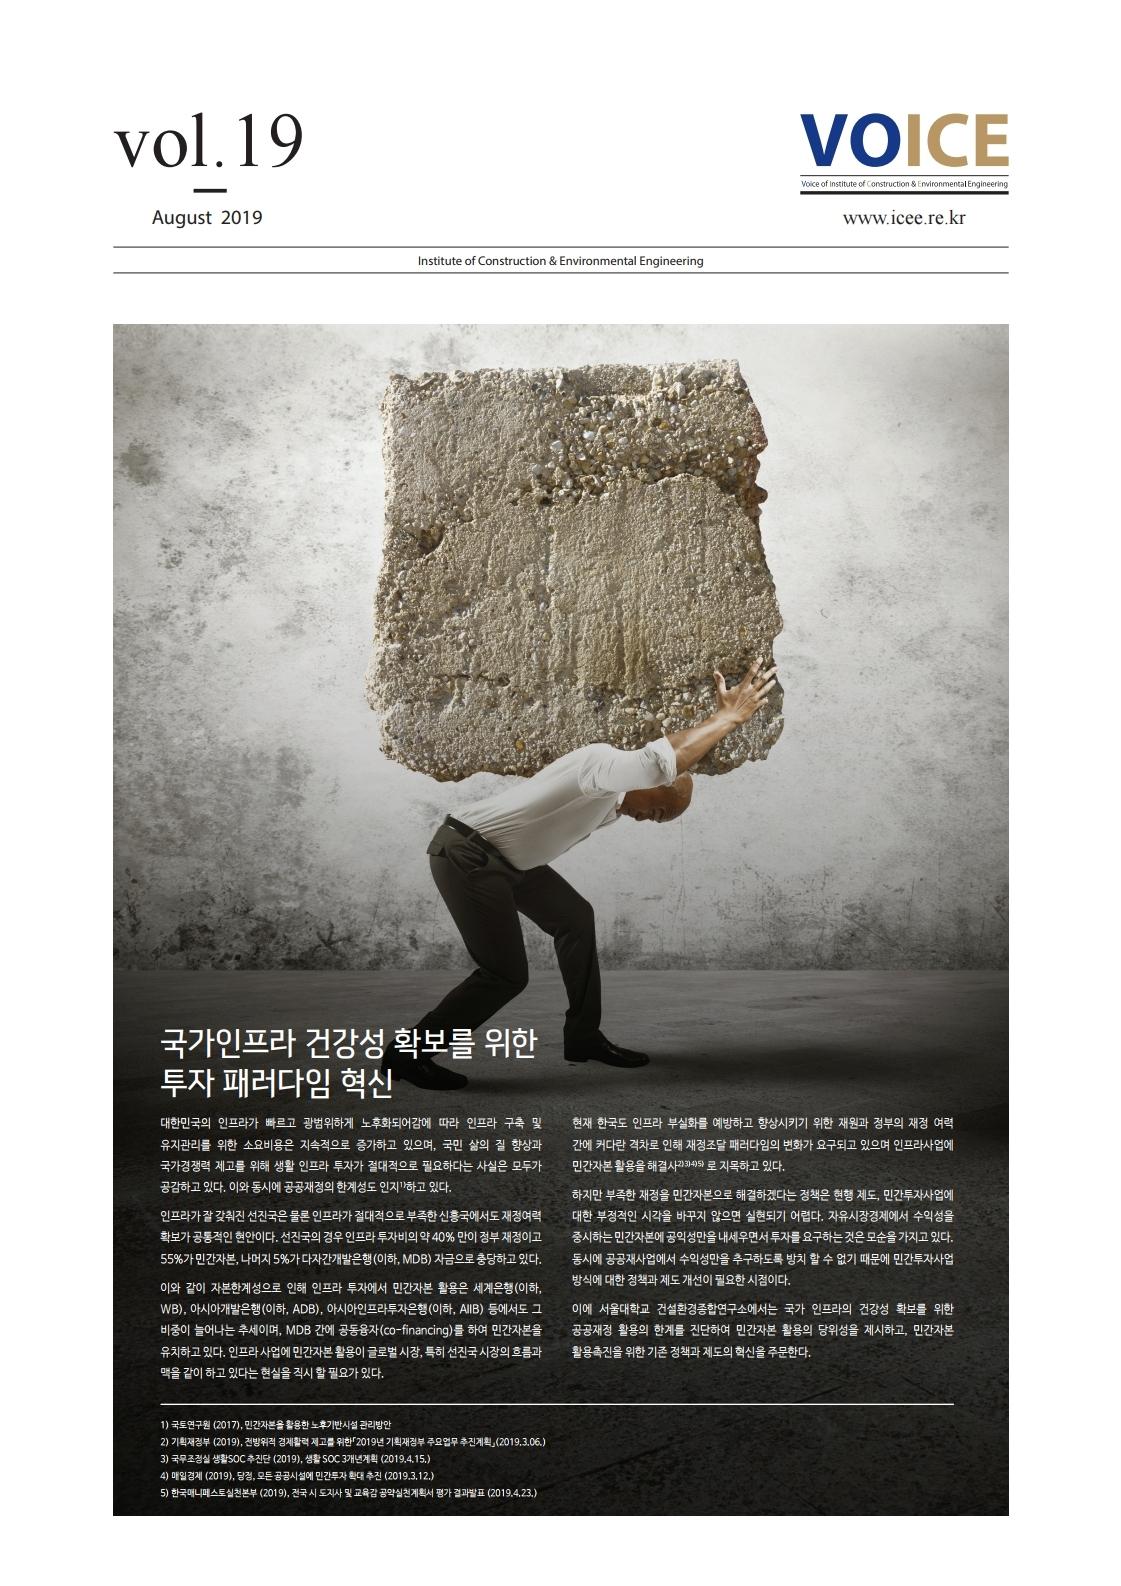 ICEE VOICE vol19-0816.pdf_page_1.jpg